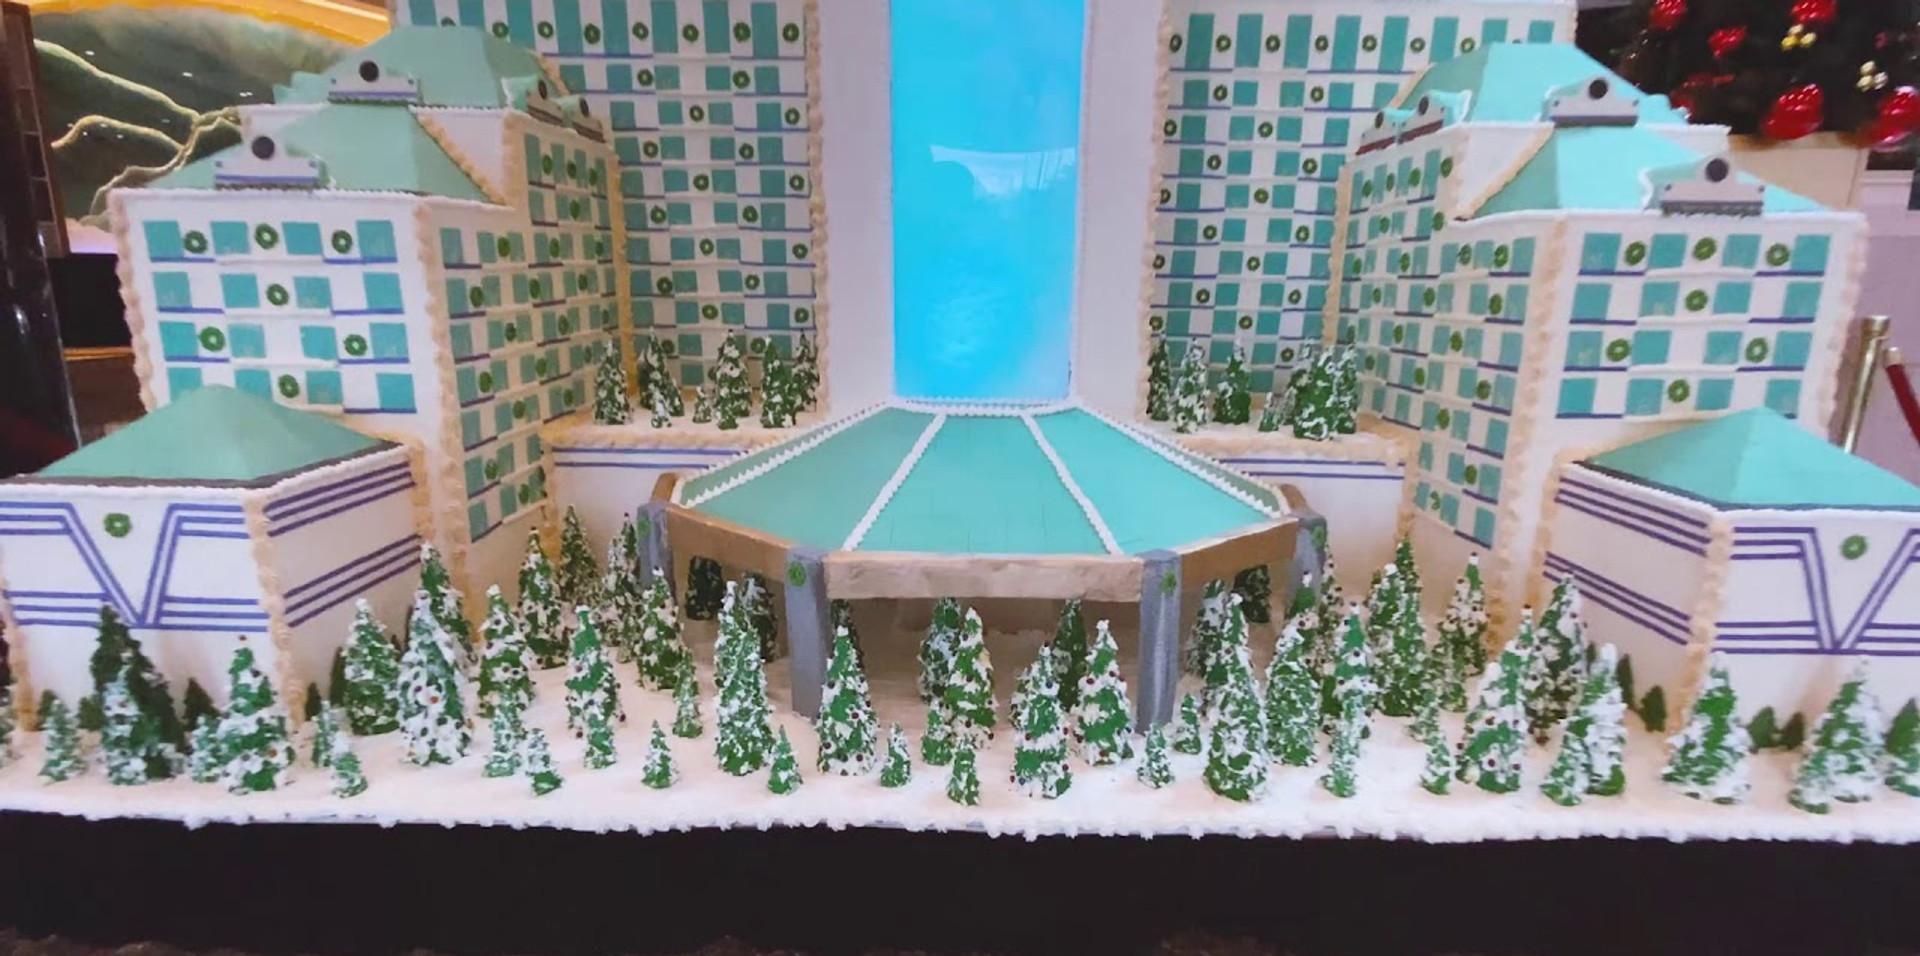 Gingerbread Houses Display